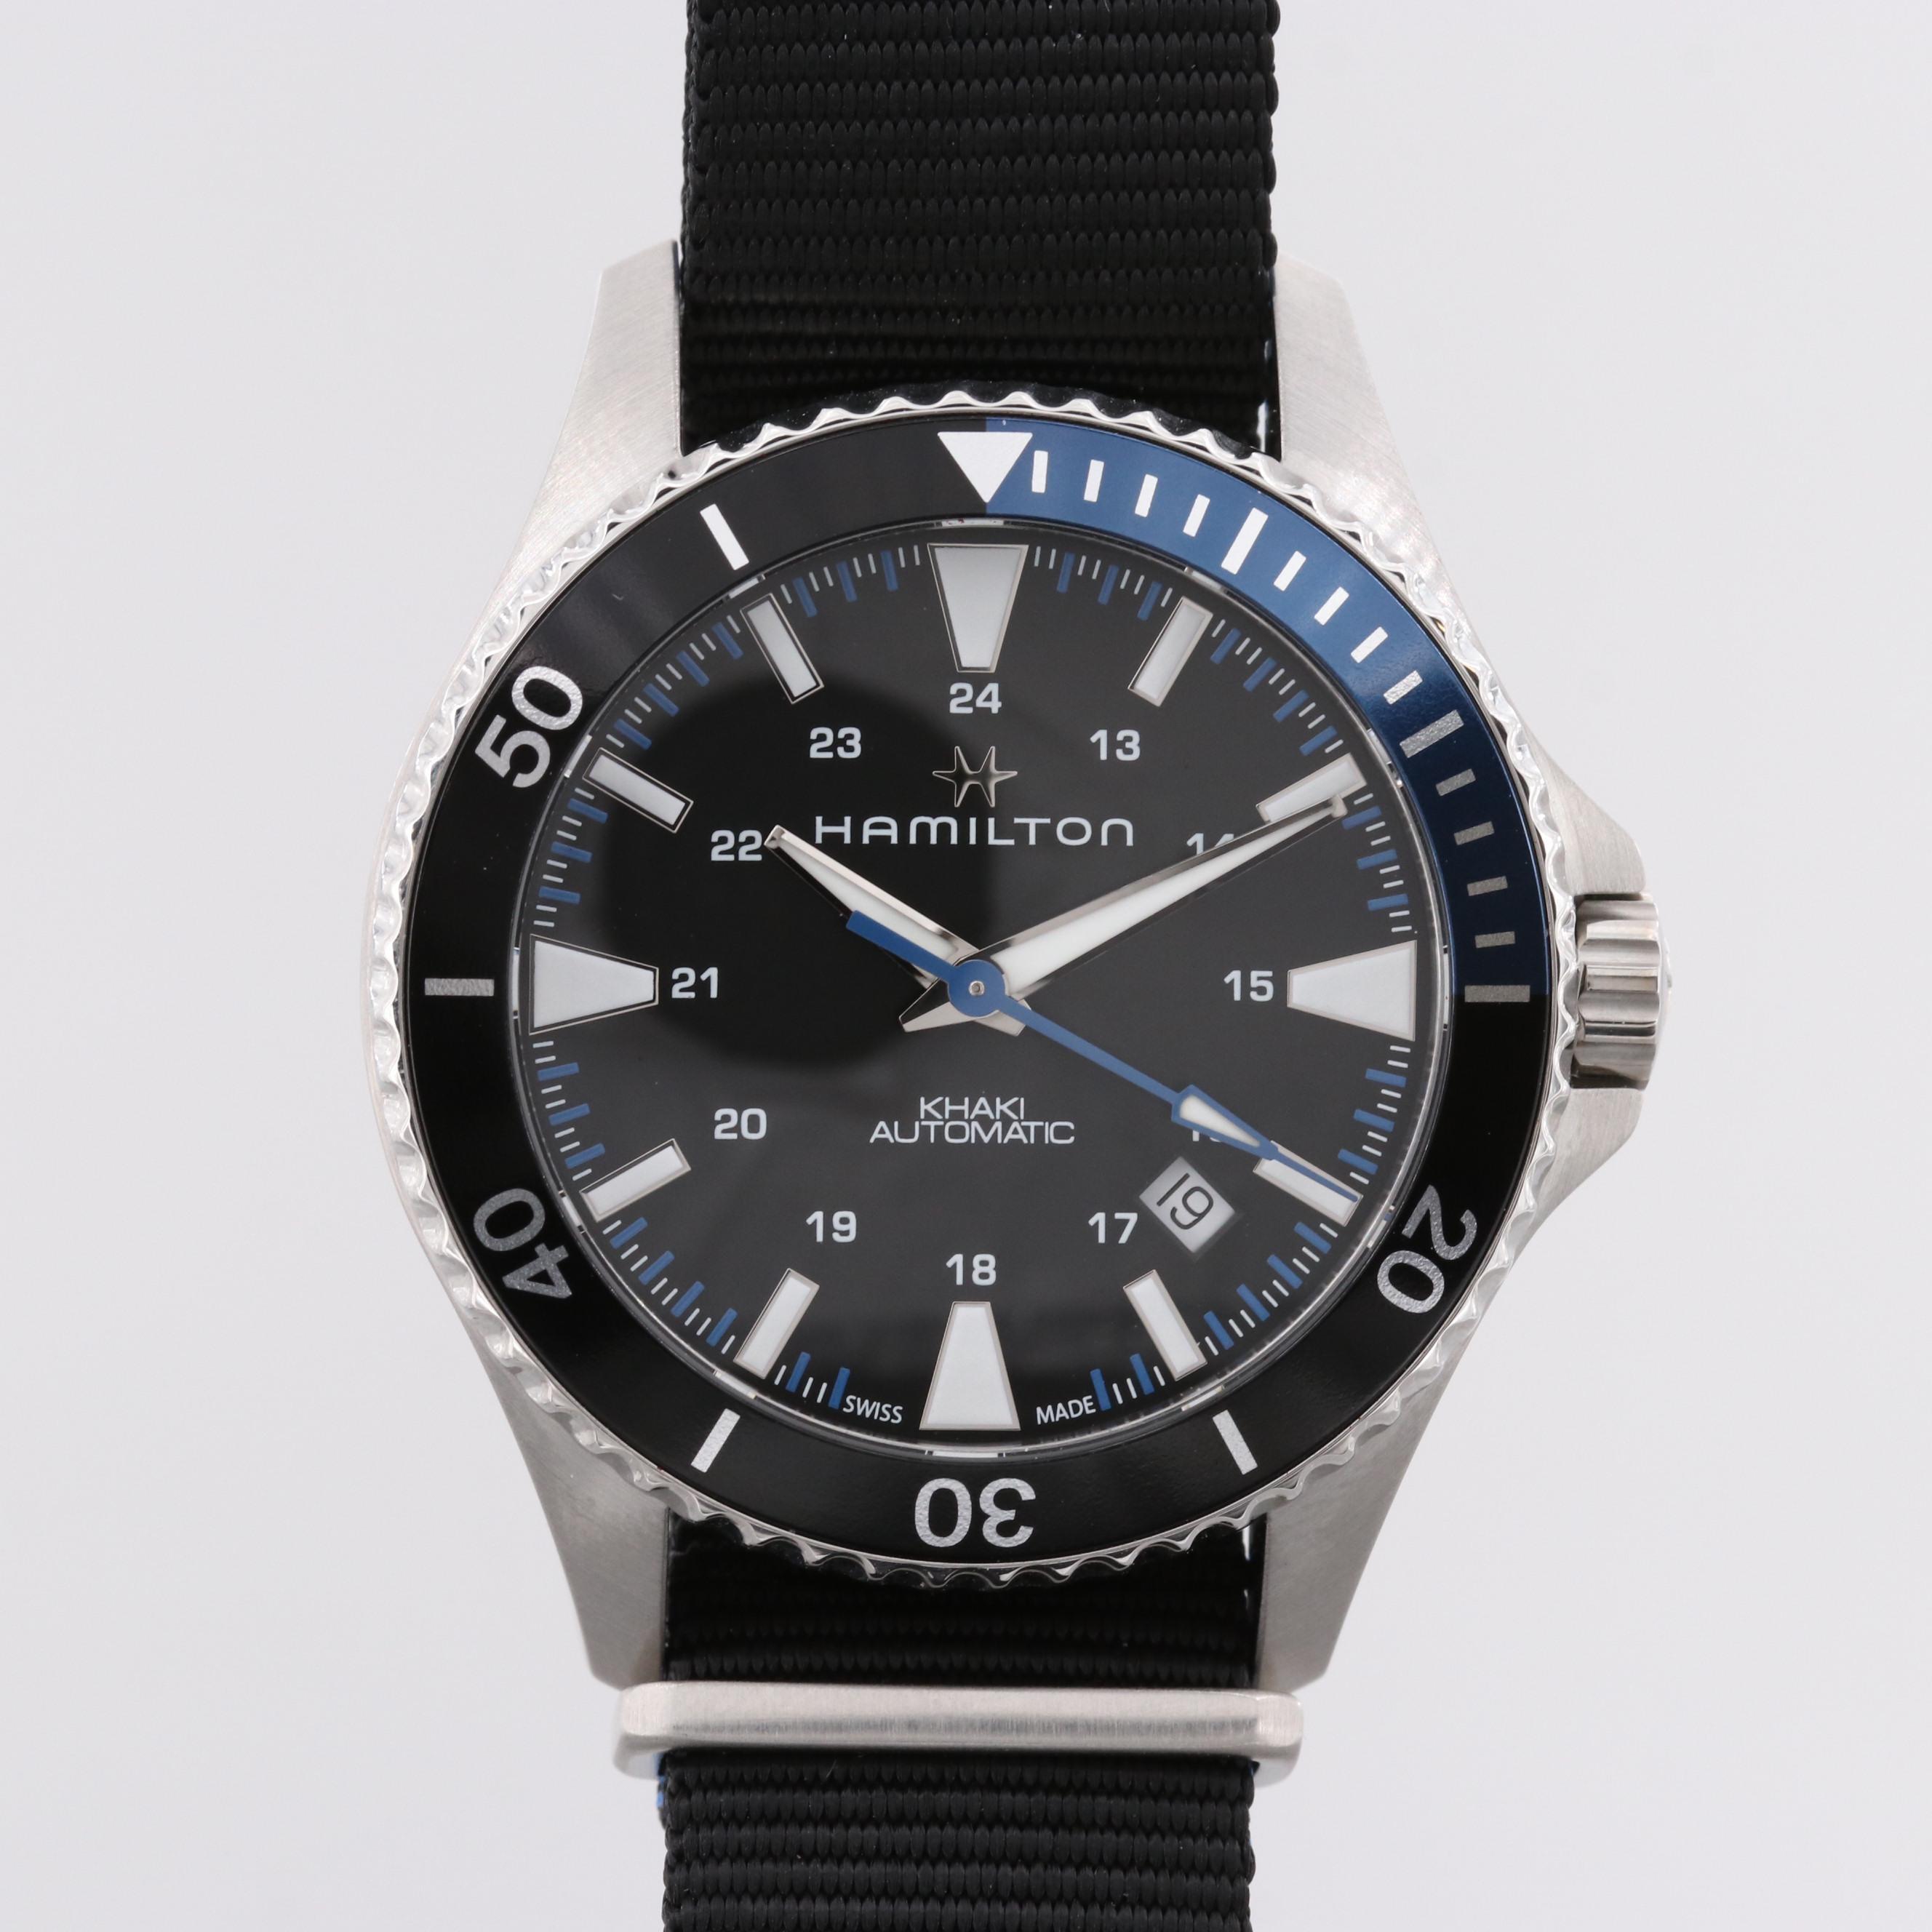 Hamilton Scuba Automatic Wristwatch With Batman Bezel and Black Dial